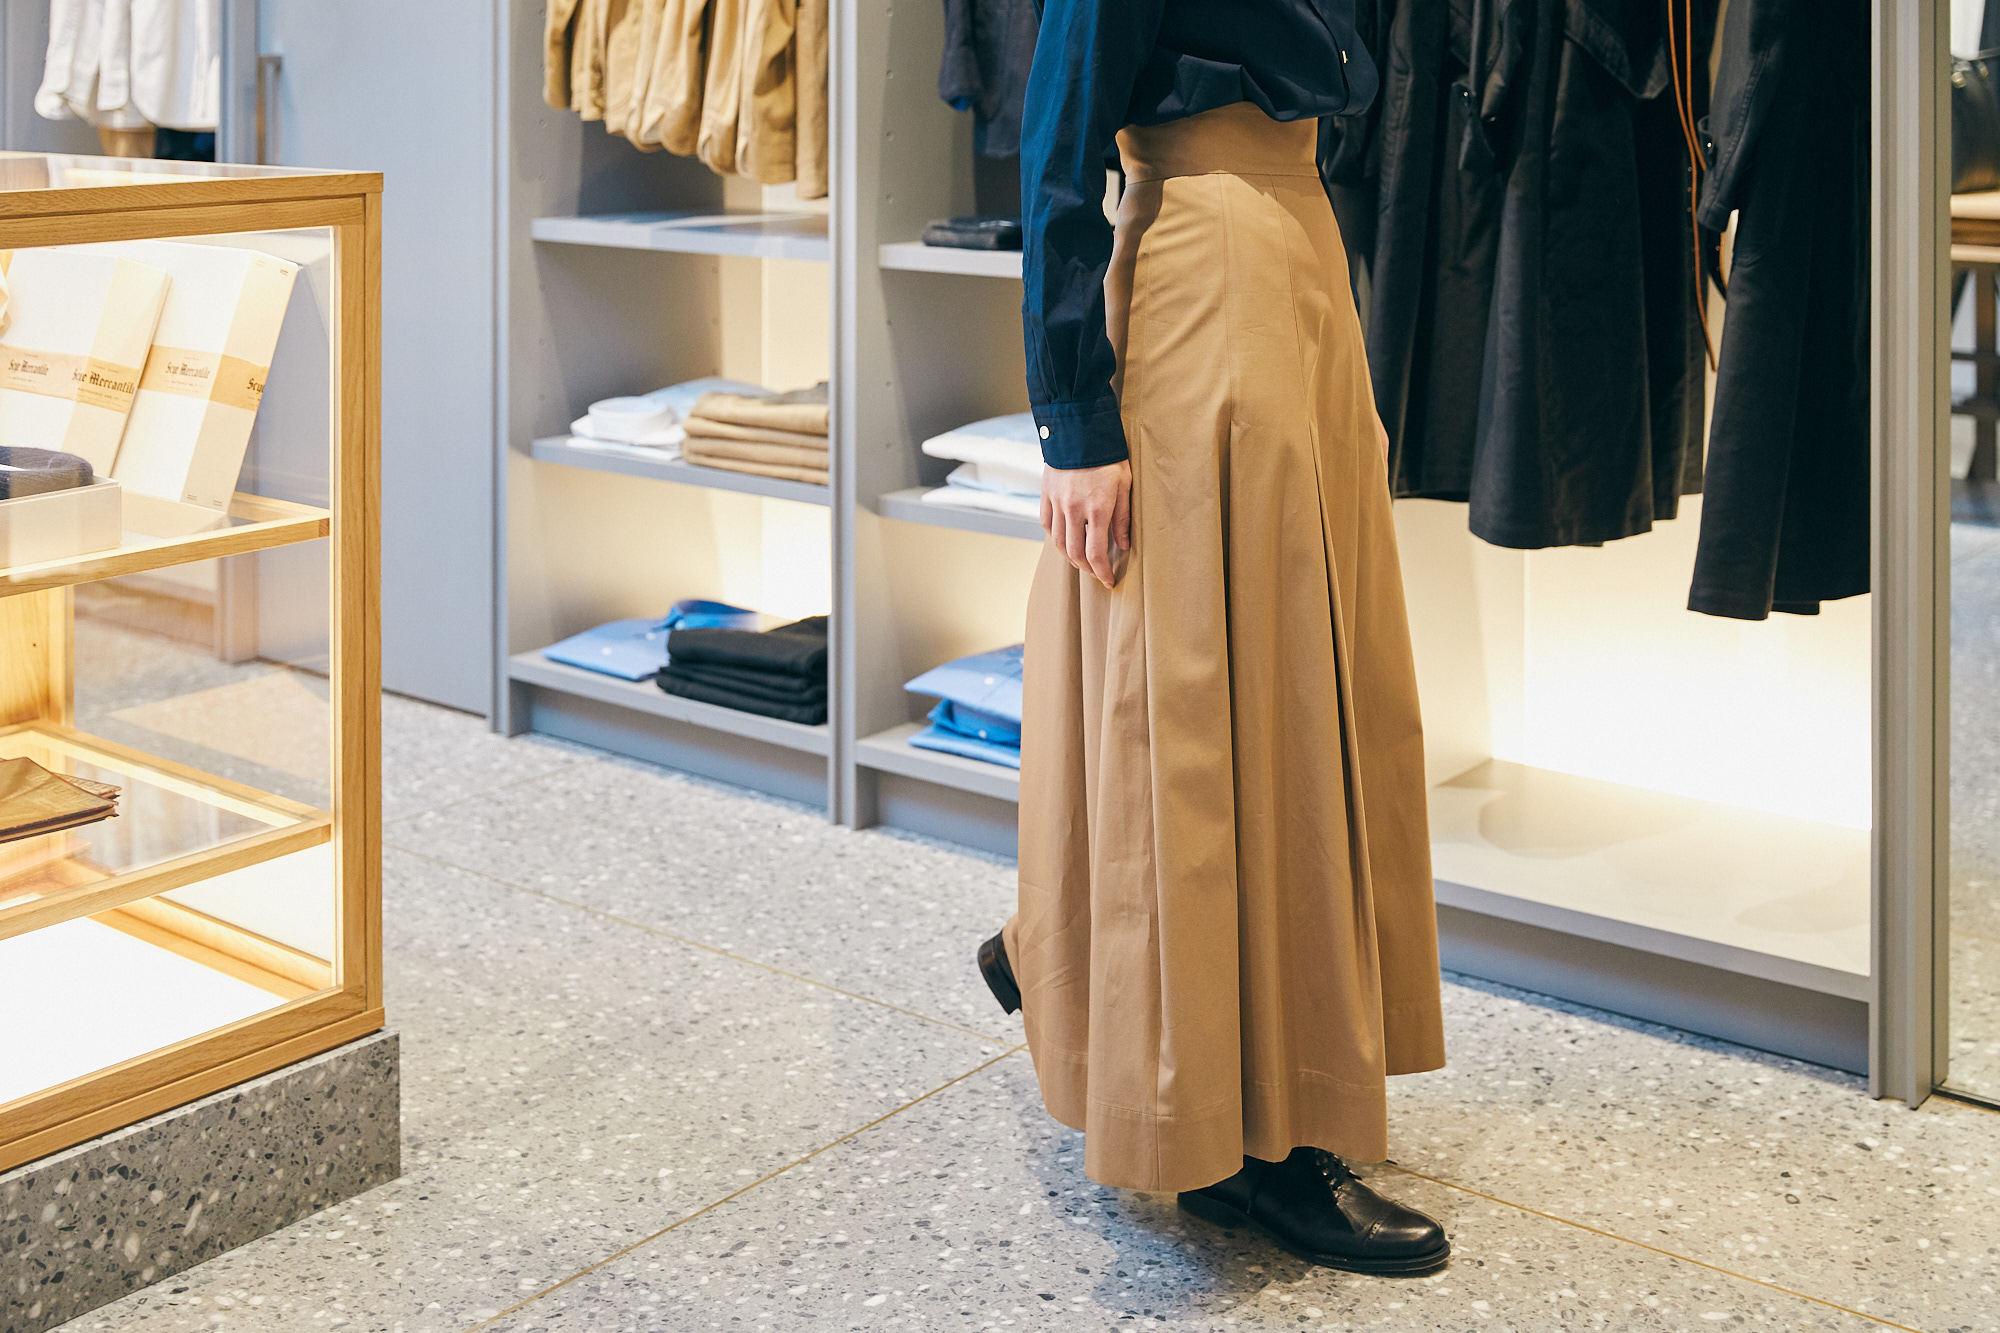 Scyeの新作スカートが春風にたなびけば、英国男子も日本男児も思わずホレてまうやろ〜!